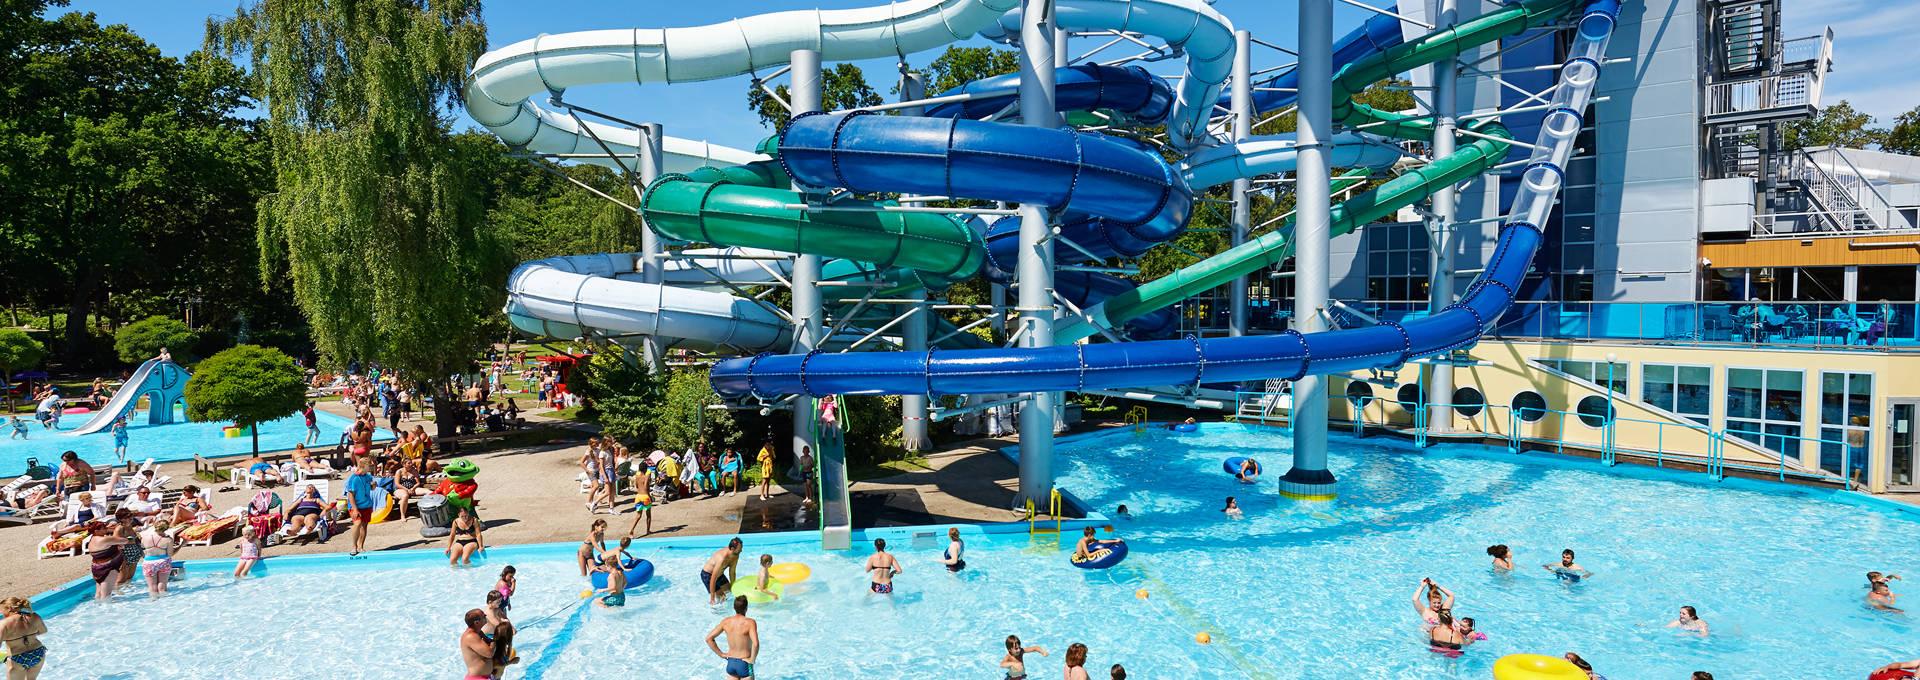 Zwembad Tikibad Duinrell Openingstijden Korting